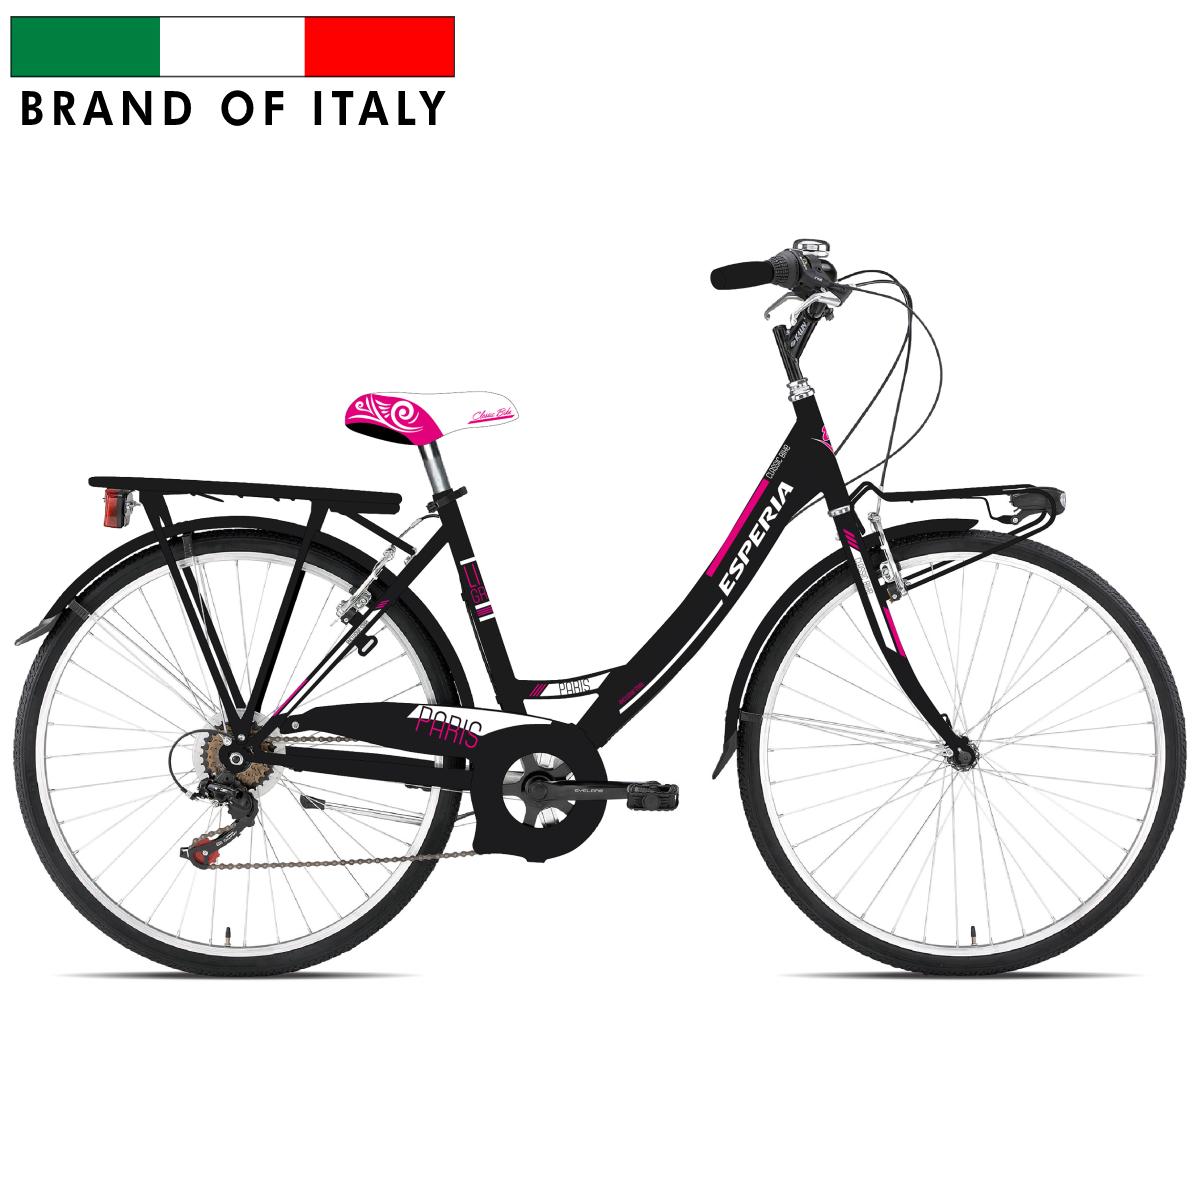 ESPERIA 2100 MONO 26 TZ50 6V BLACK 102100D Pilsētas velosipēds